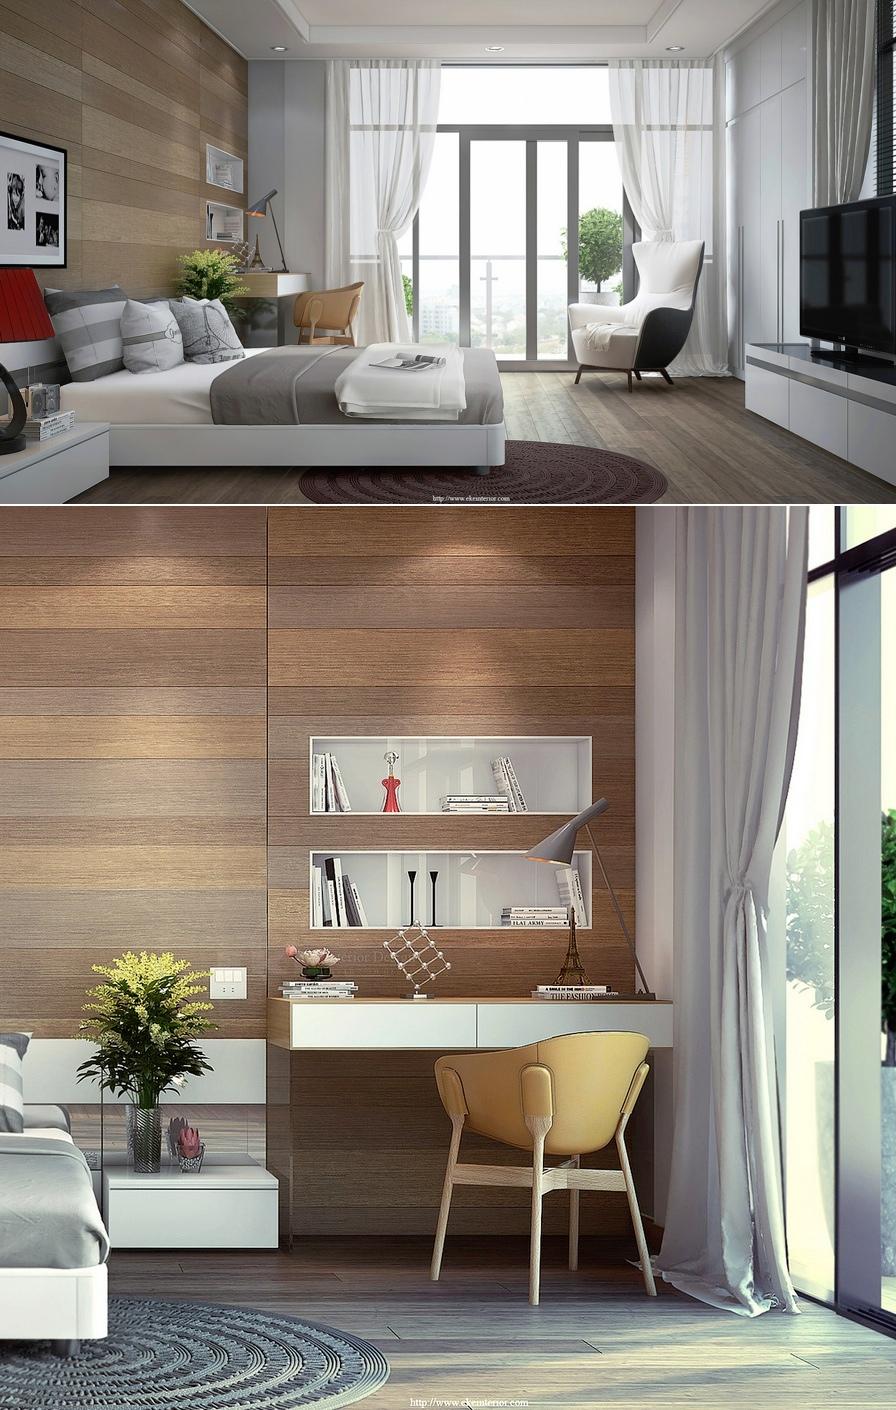 Bedrooms Furnitures Designs Best Bed Designs Ideas: 20 Modern Bedroom Designs